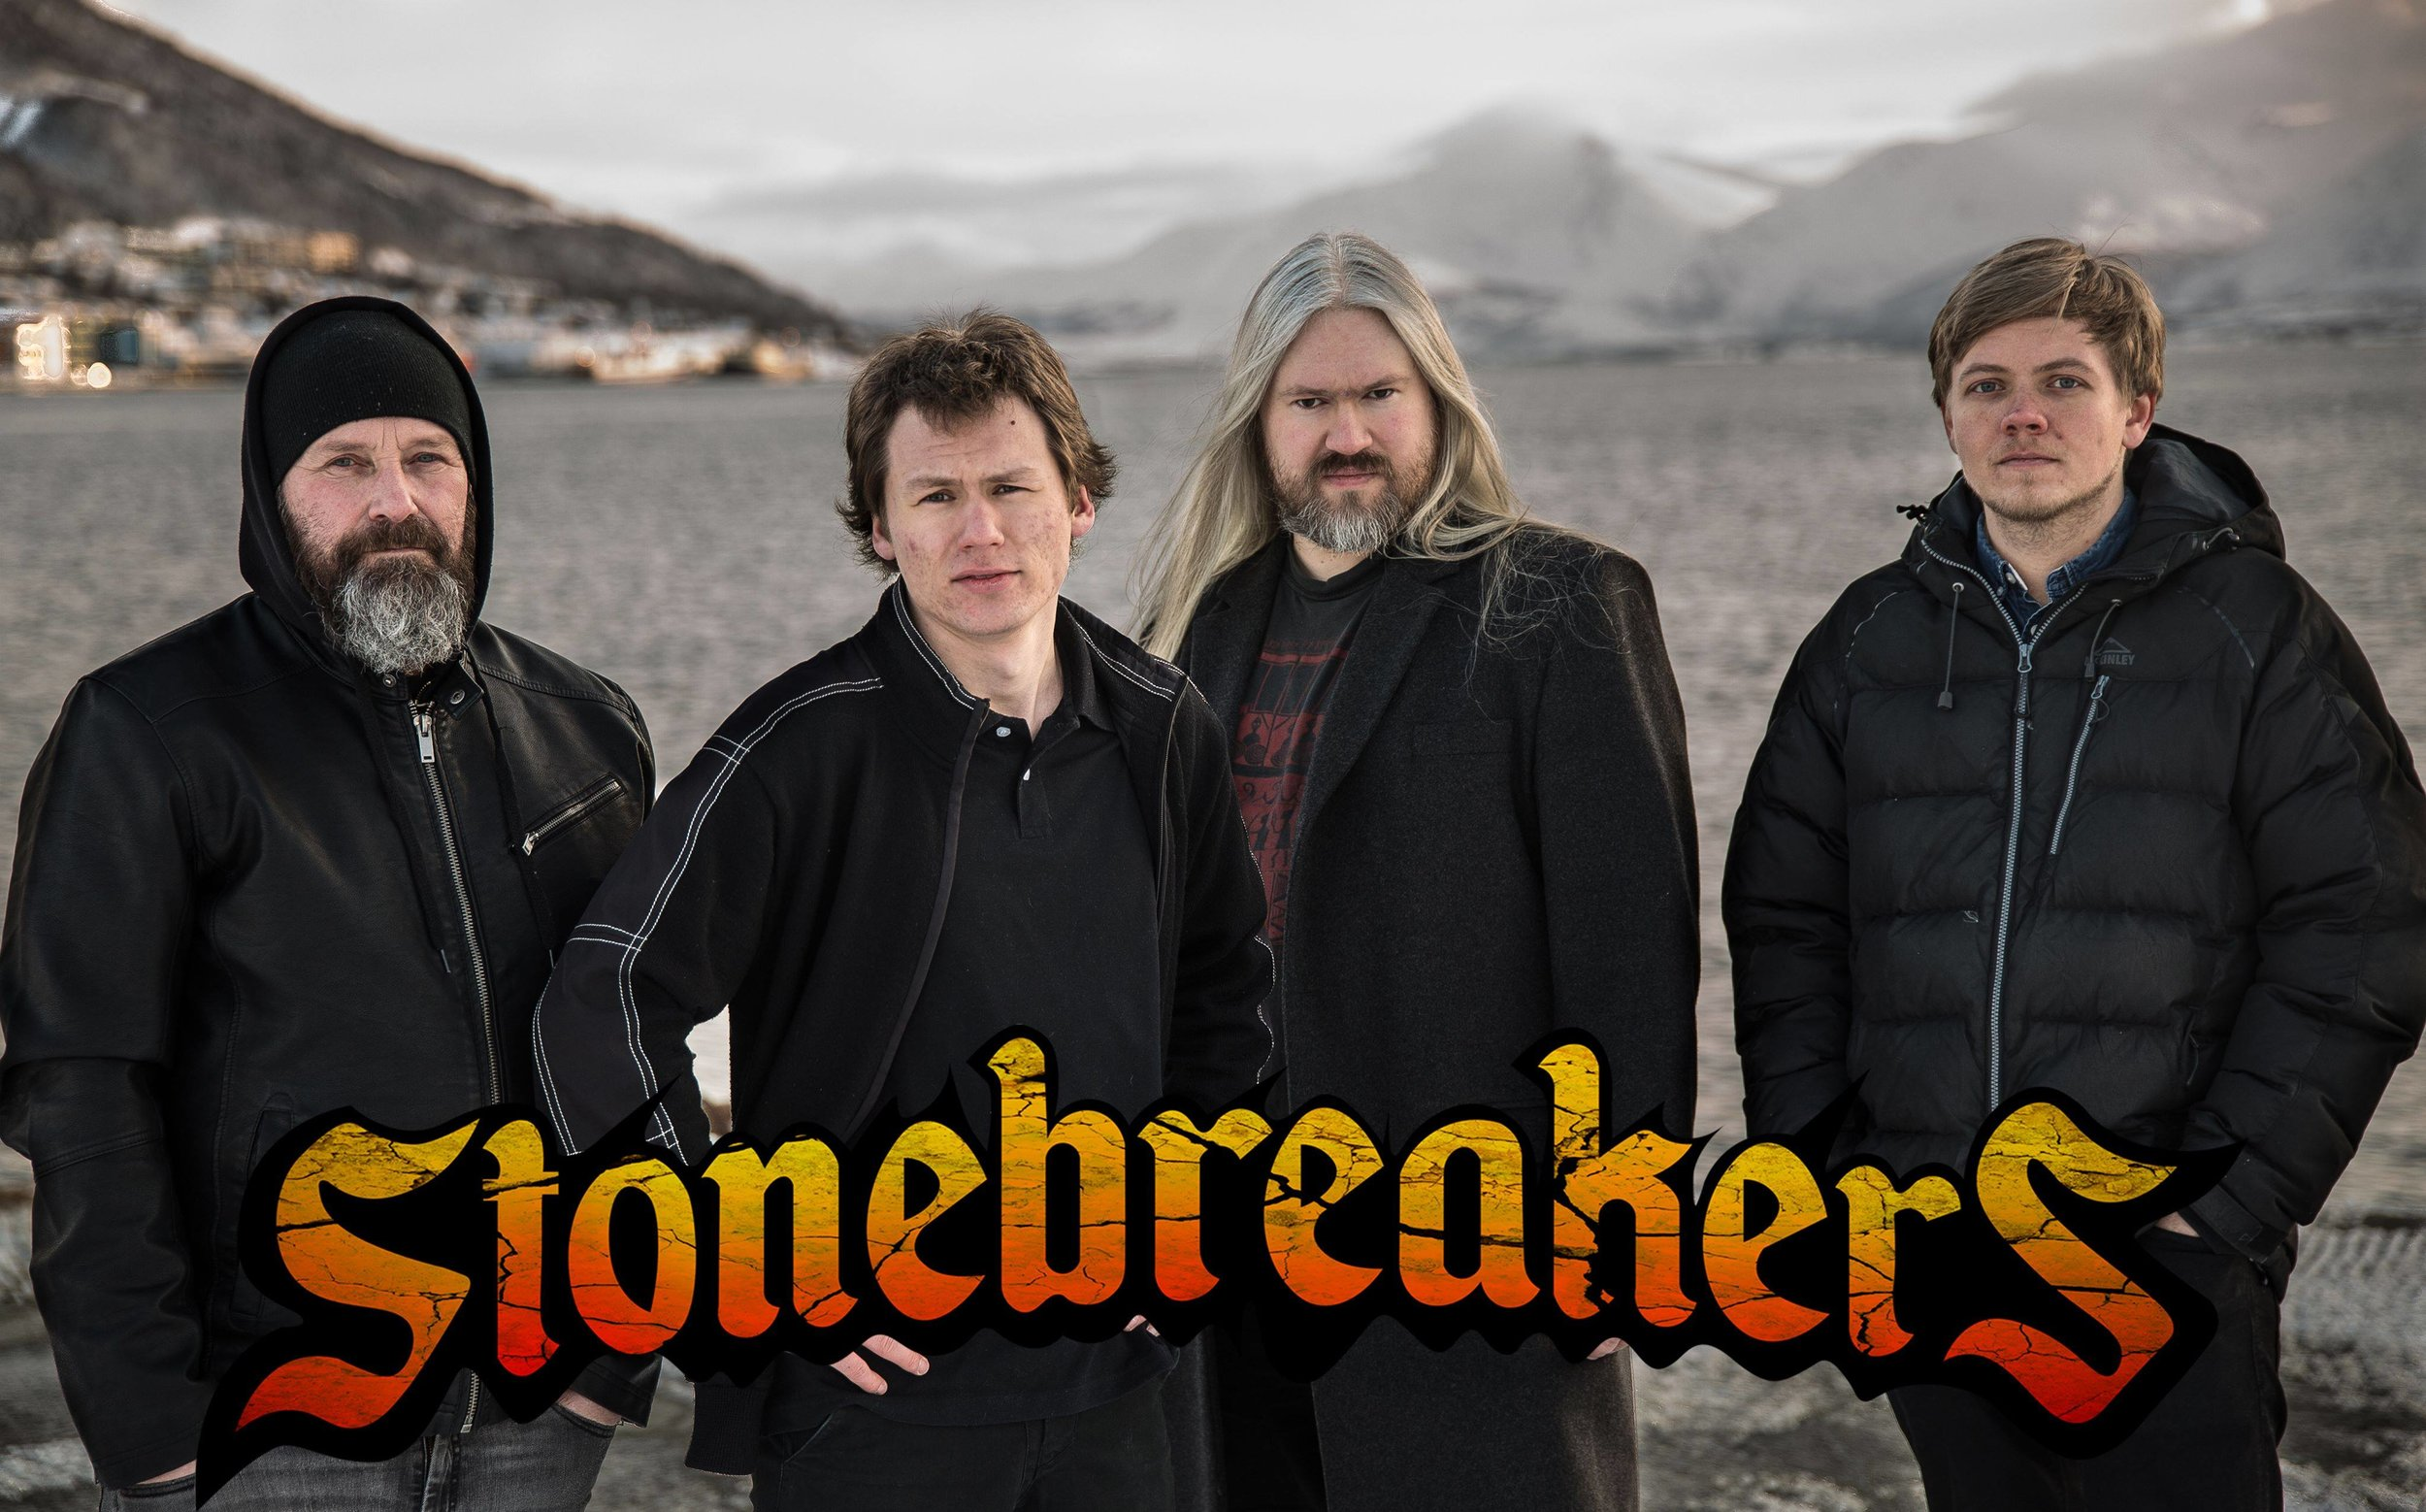 Stonebreakers